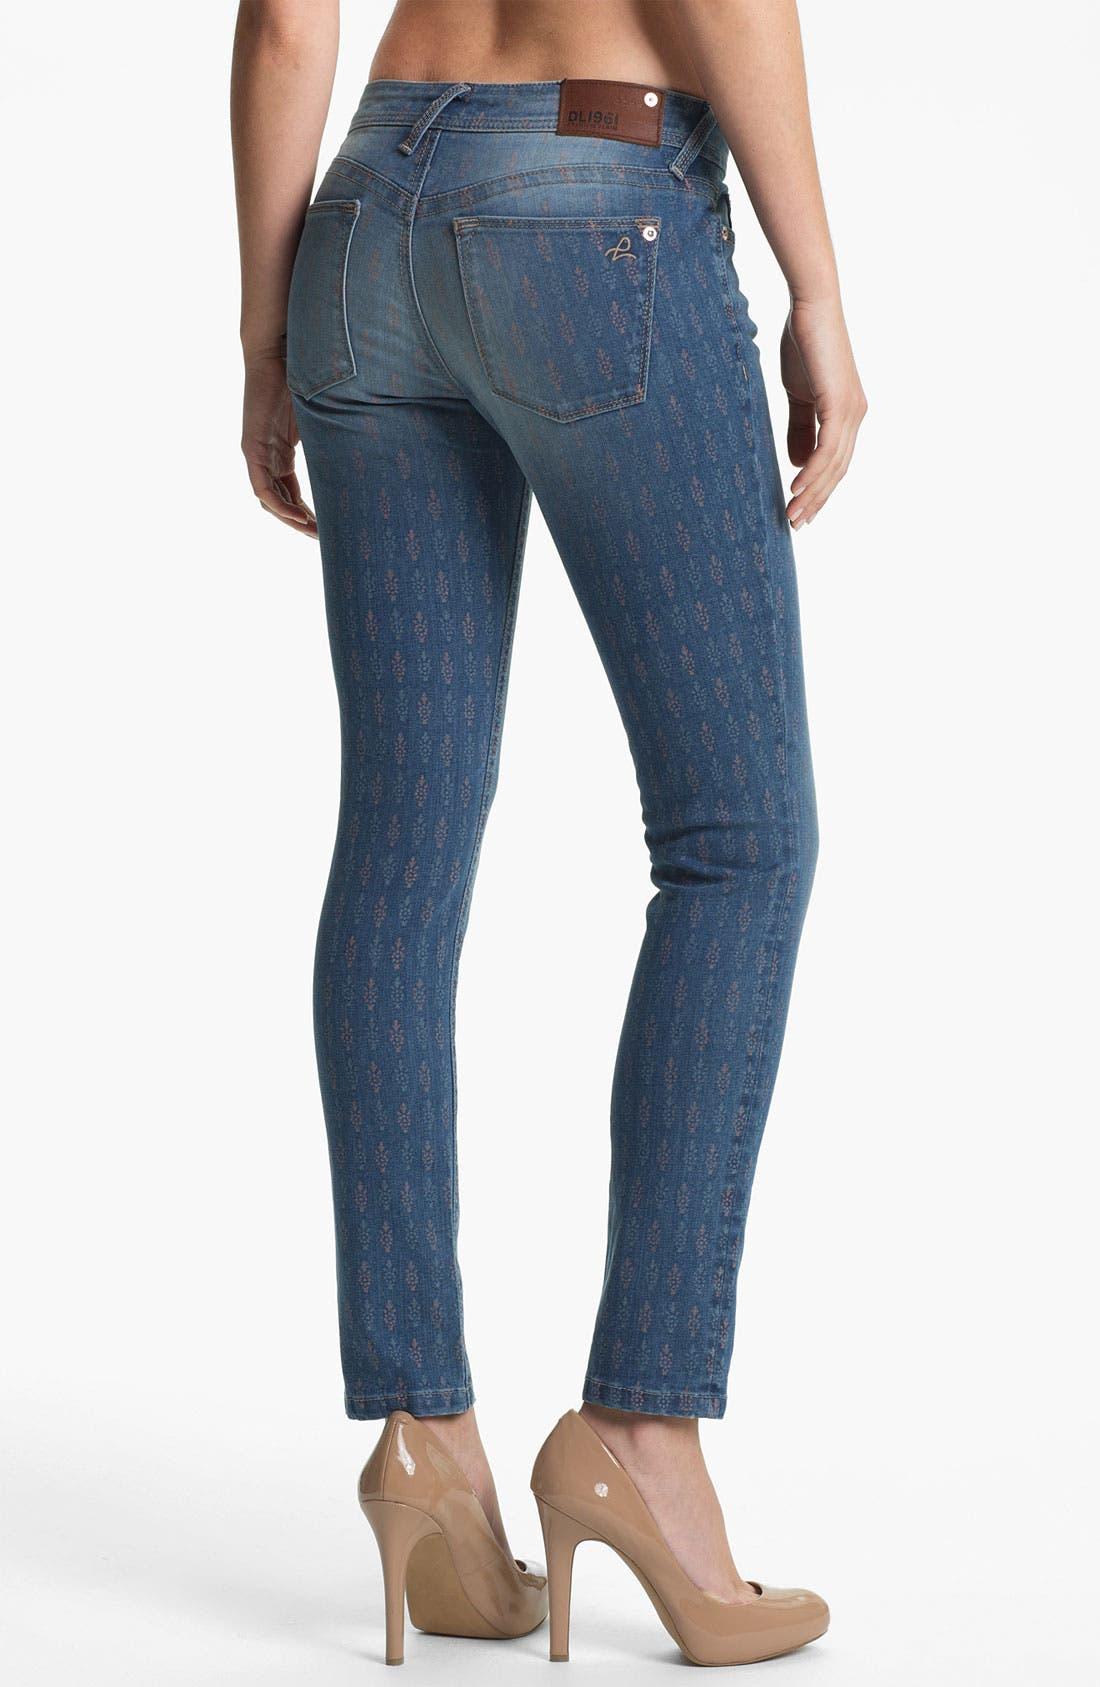 Alternate Image 2  - DL1961 'Amanda' X-Fit Stretch Print Denim Skinny Jeans (Greenville)